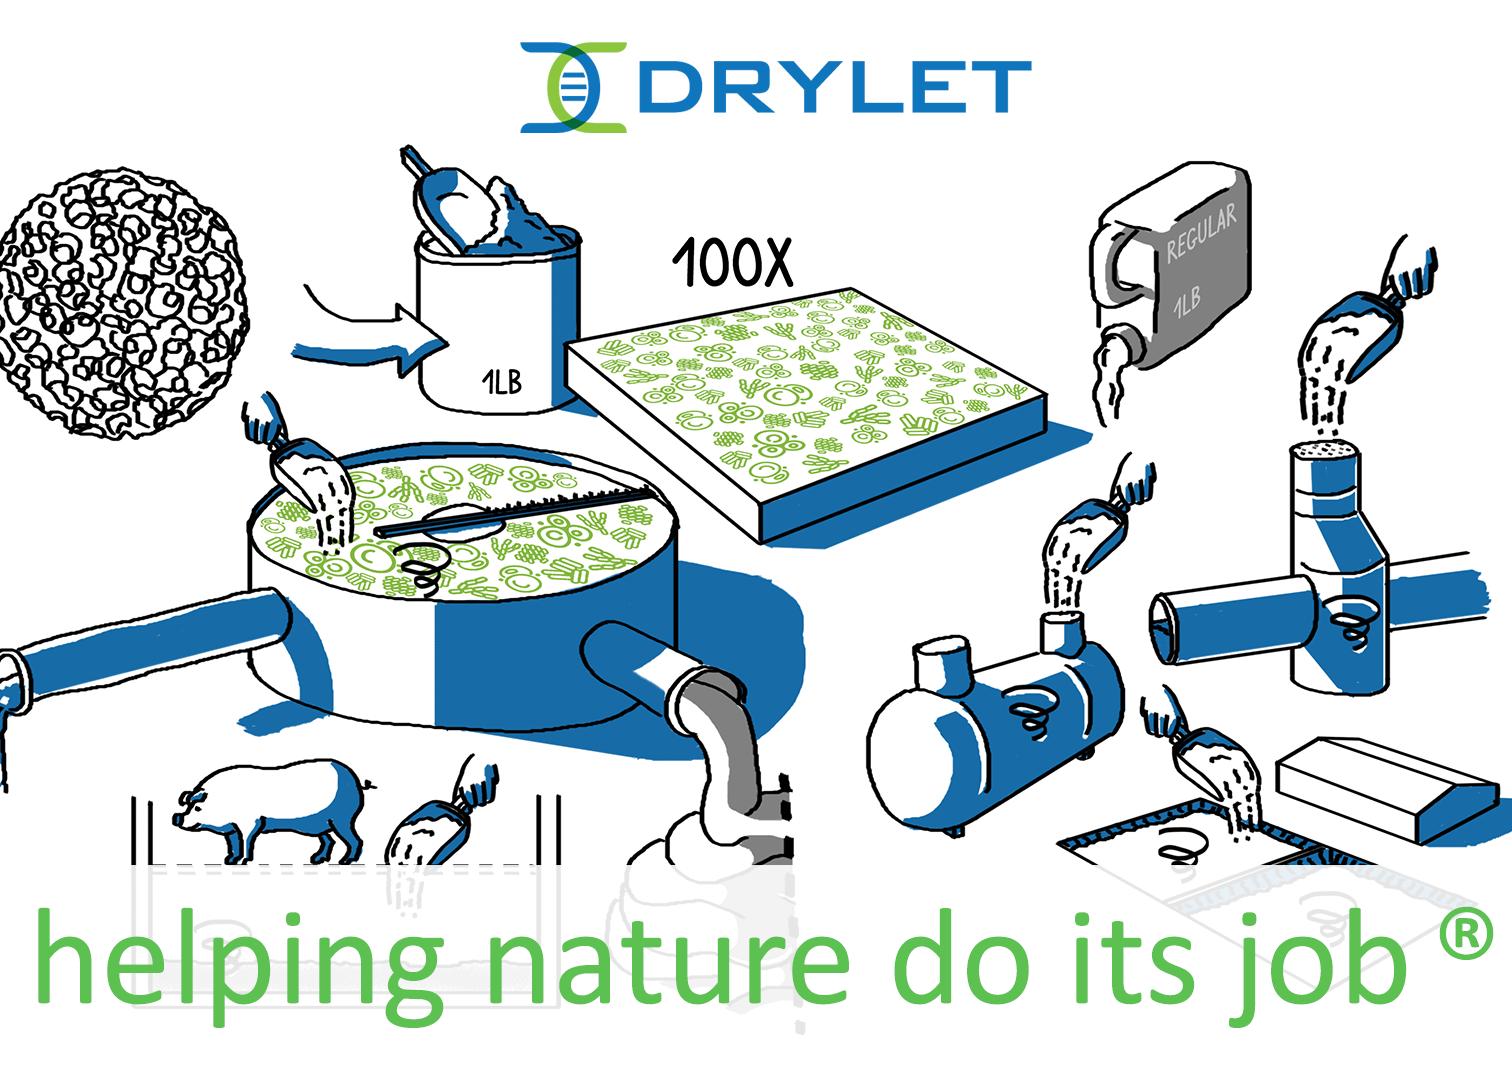 Drylet: helping nature do its job